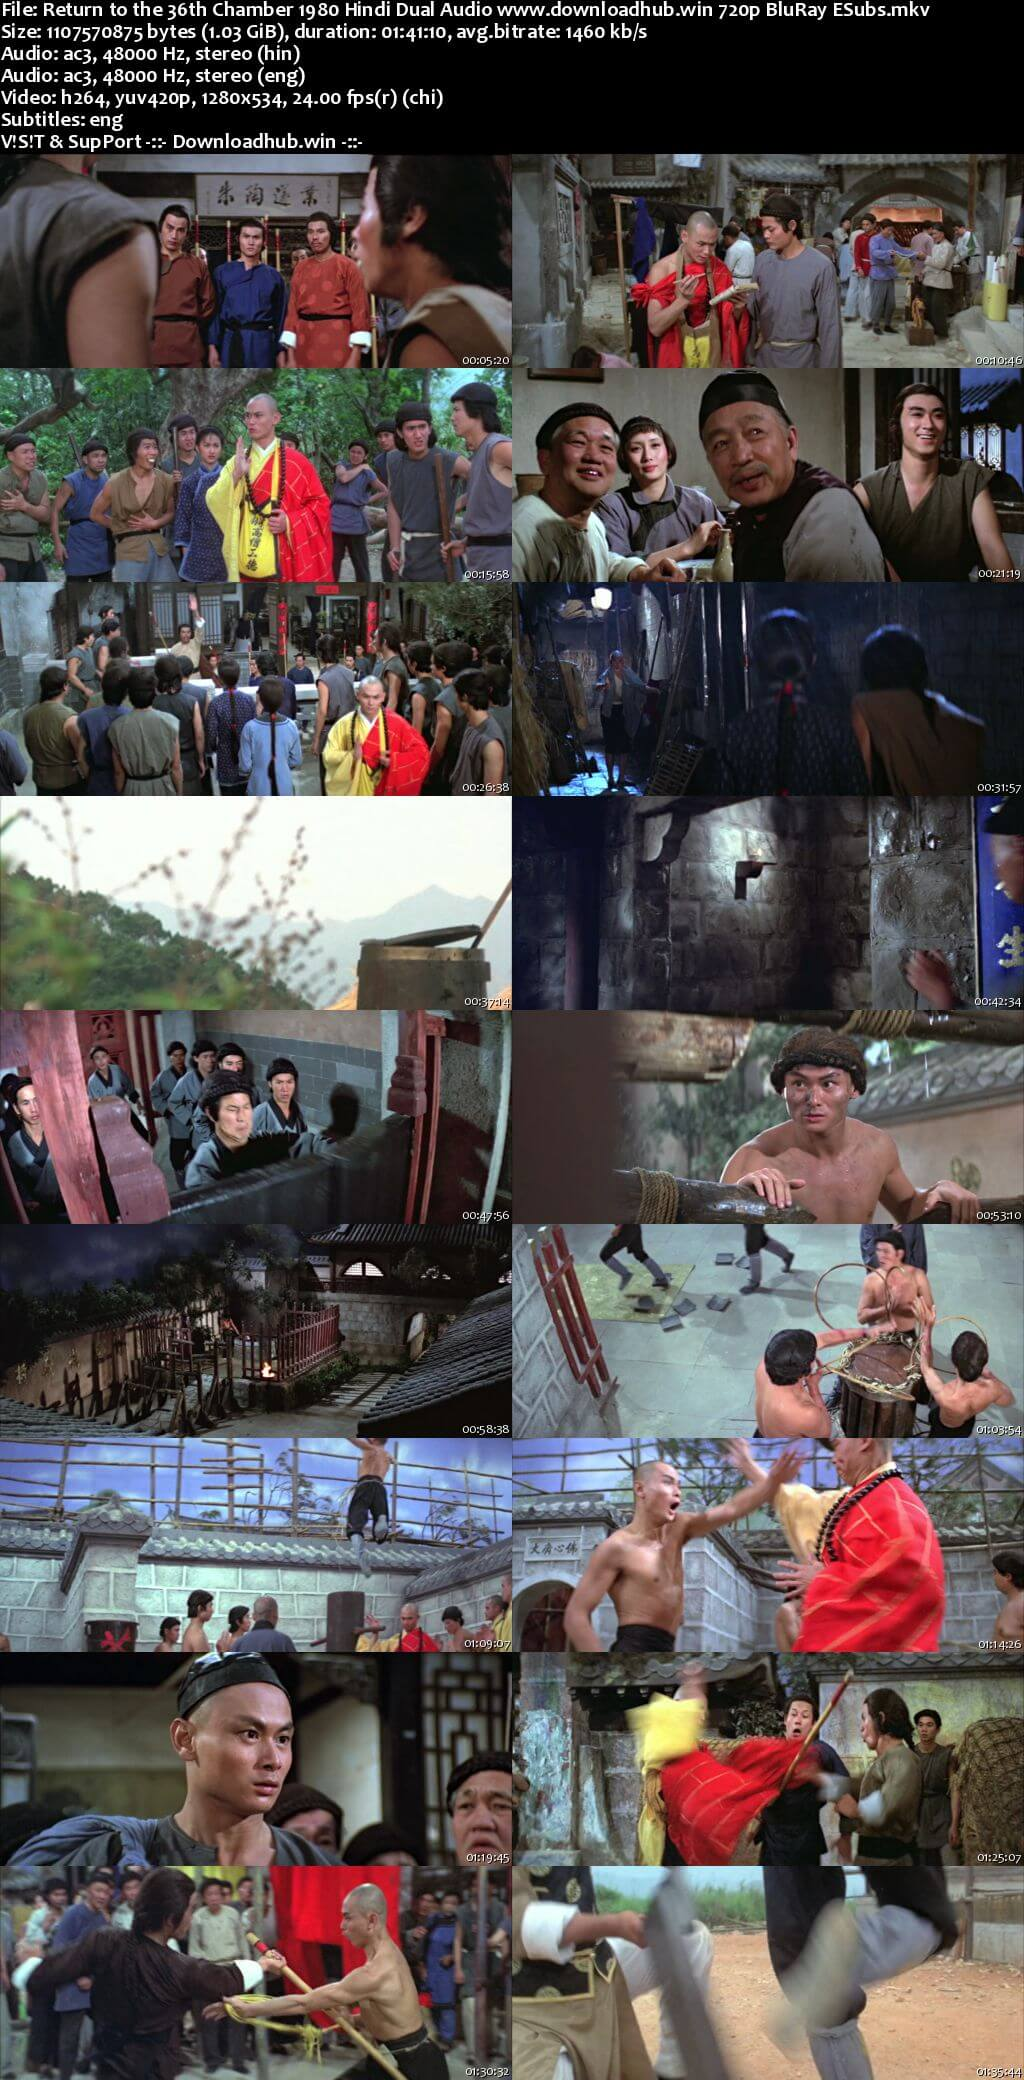 Return to the 36th Chamber 1980 Hindi Dual Audio 720p BluRay ESubs